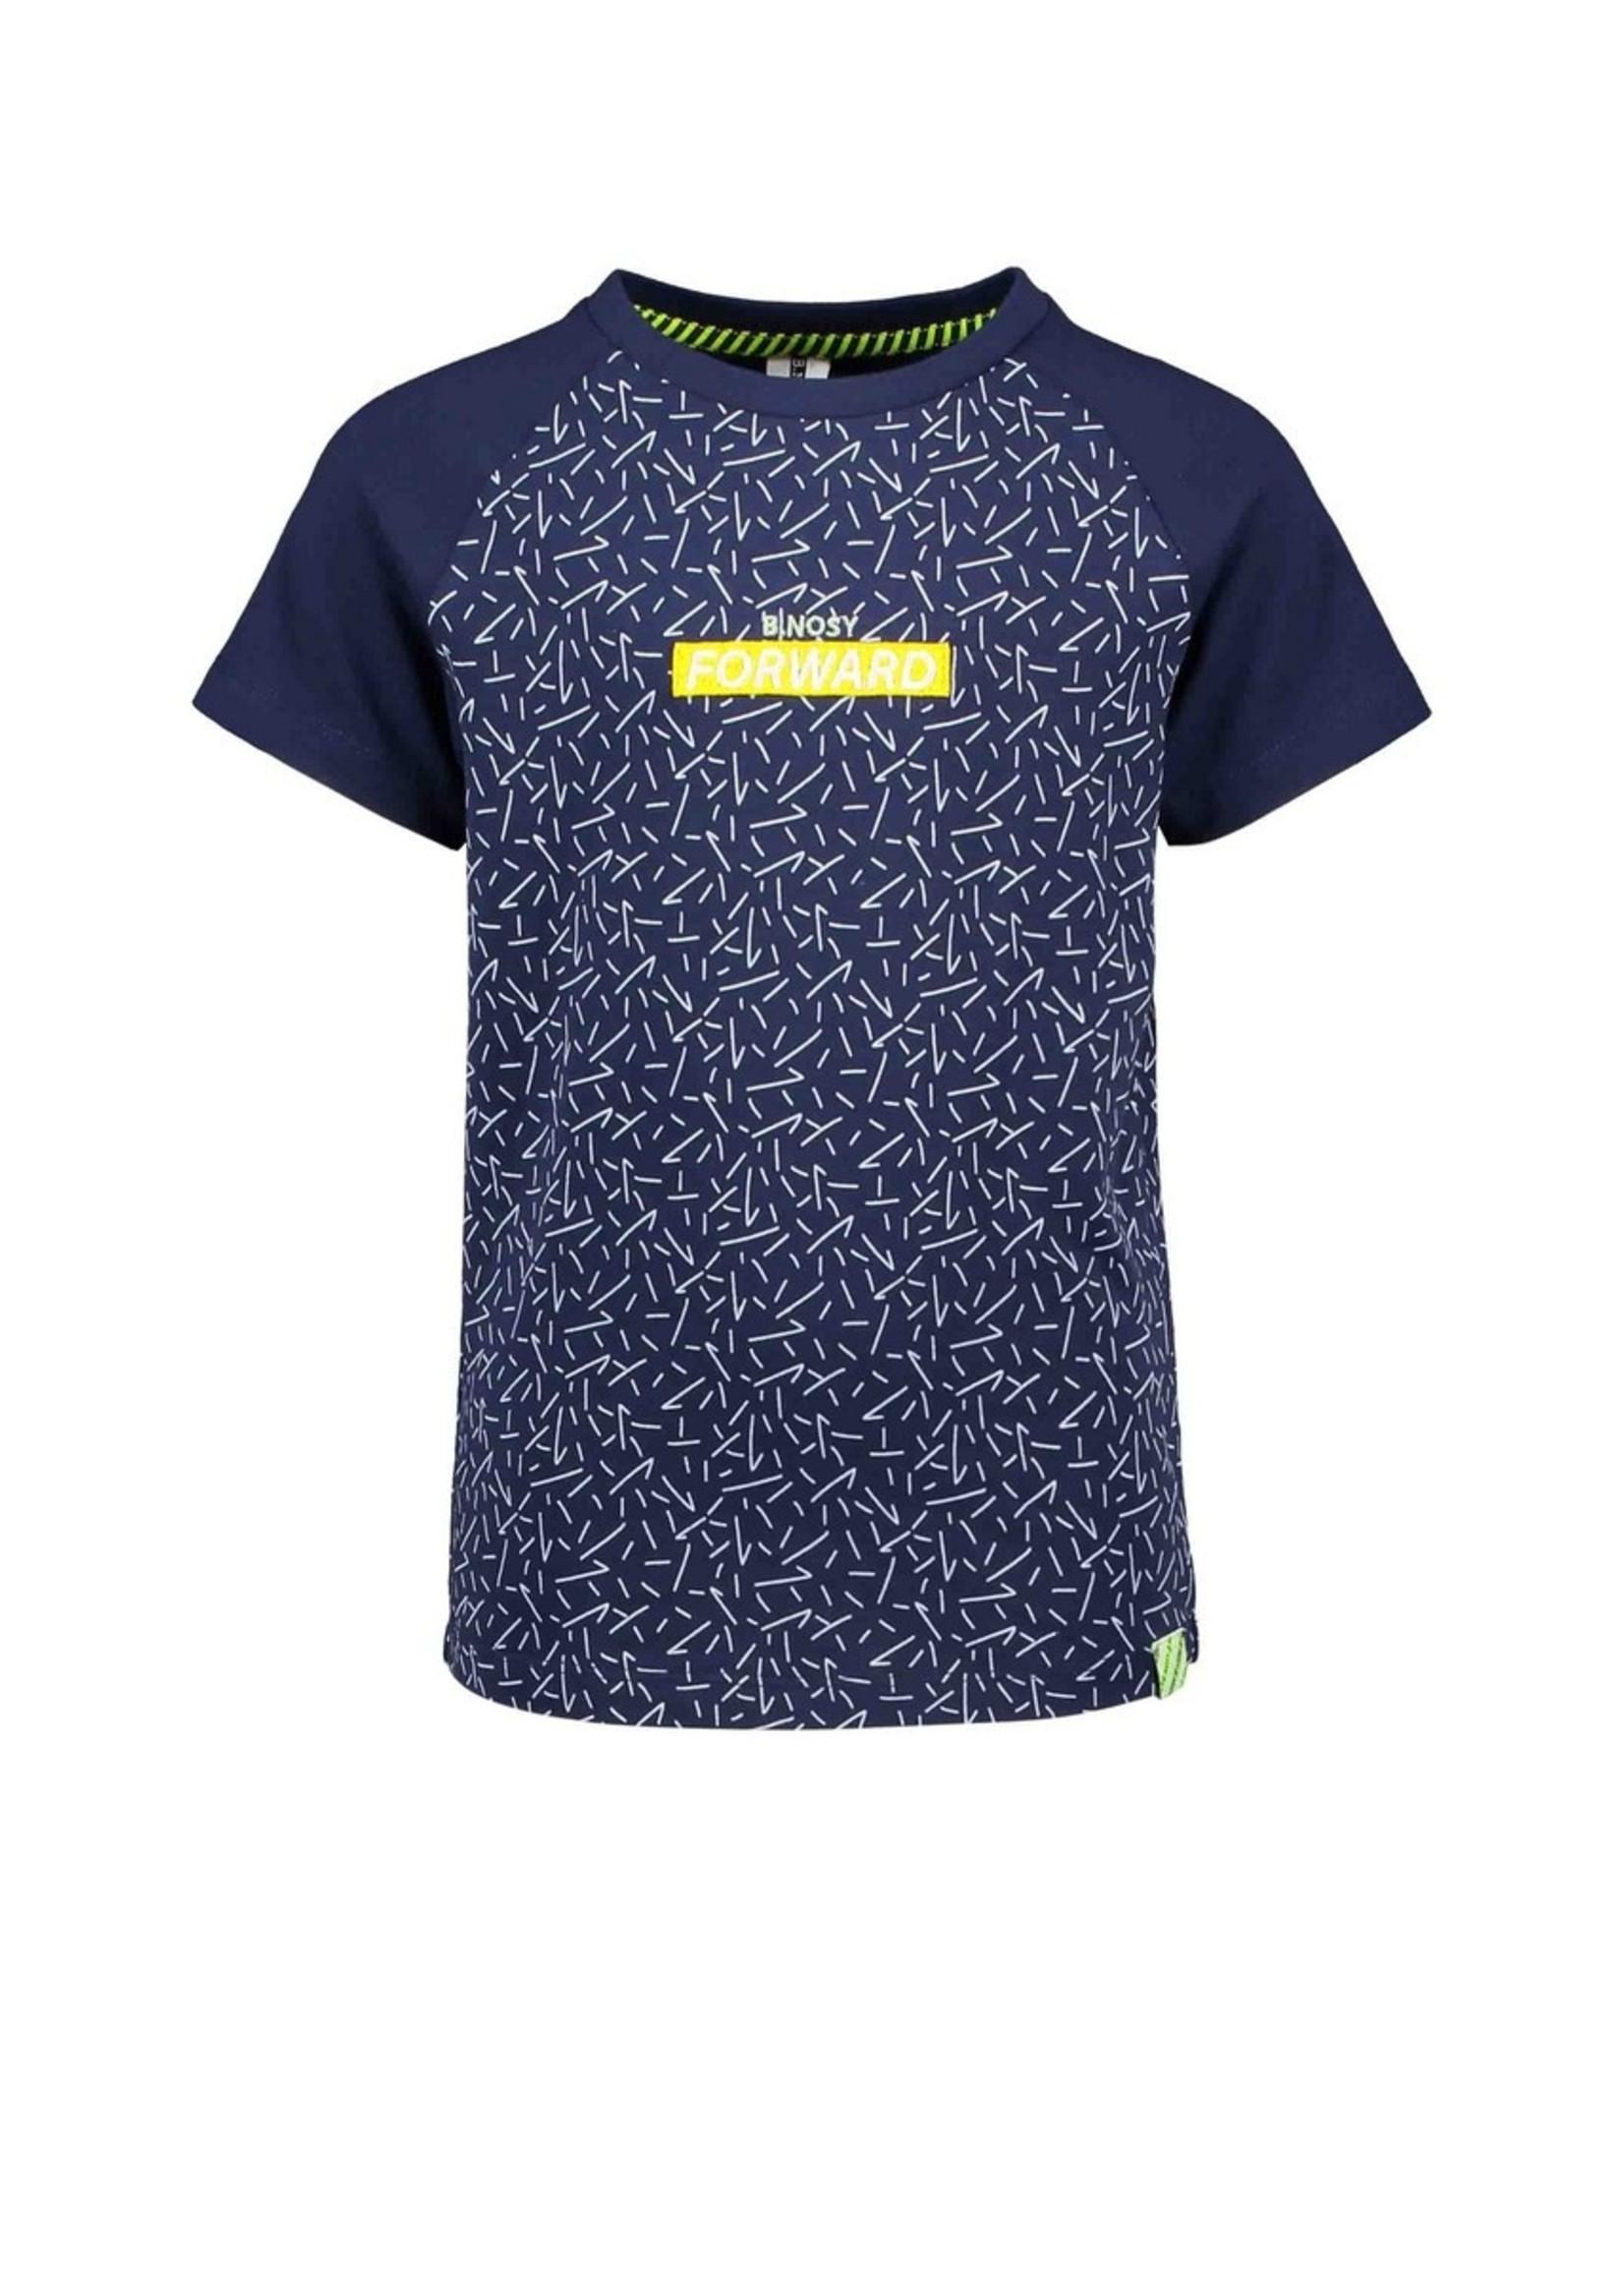 B.nosy Shirt Kris Kras Space Blue